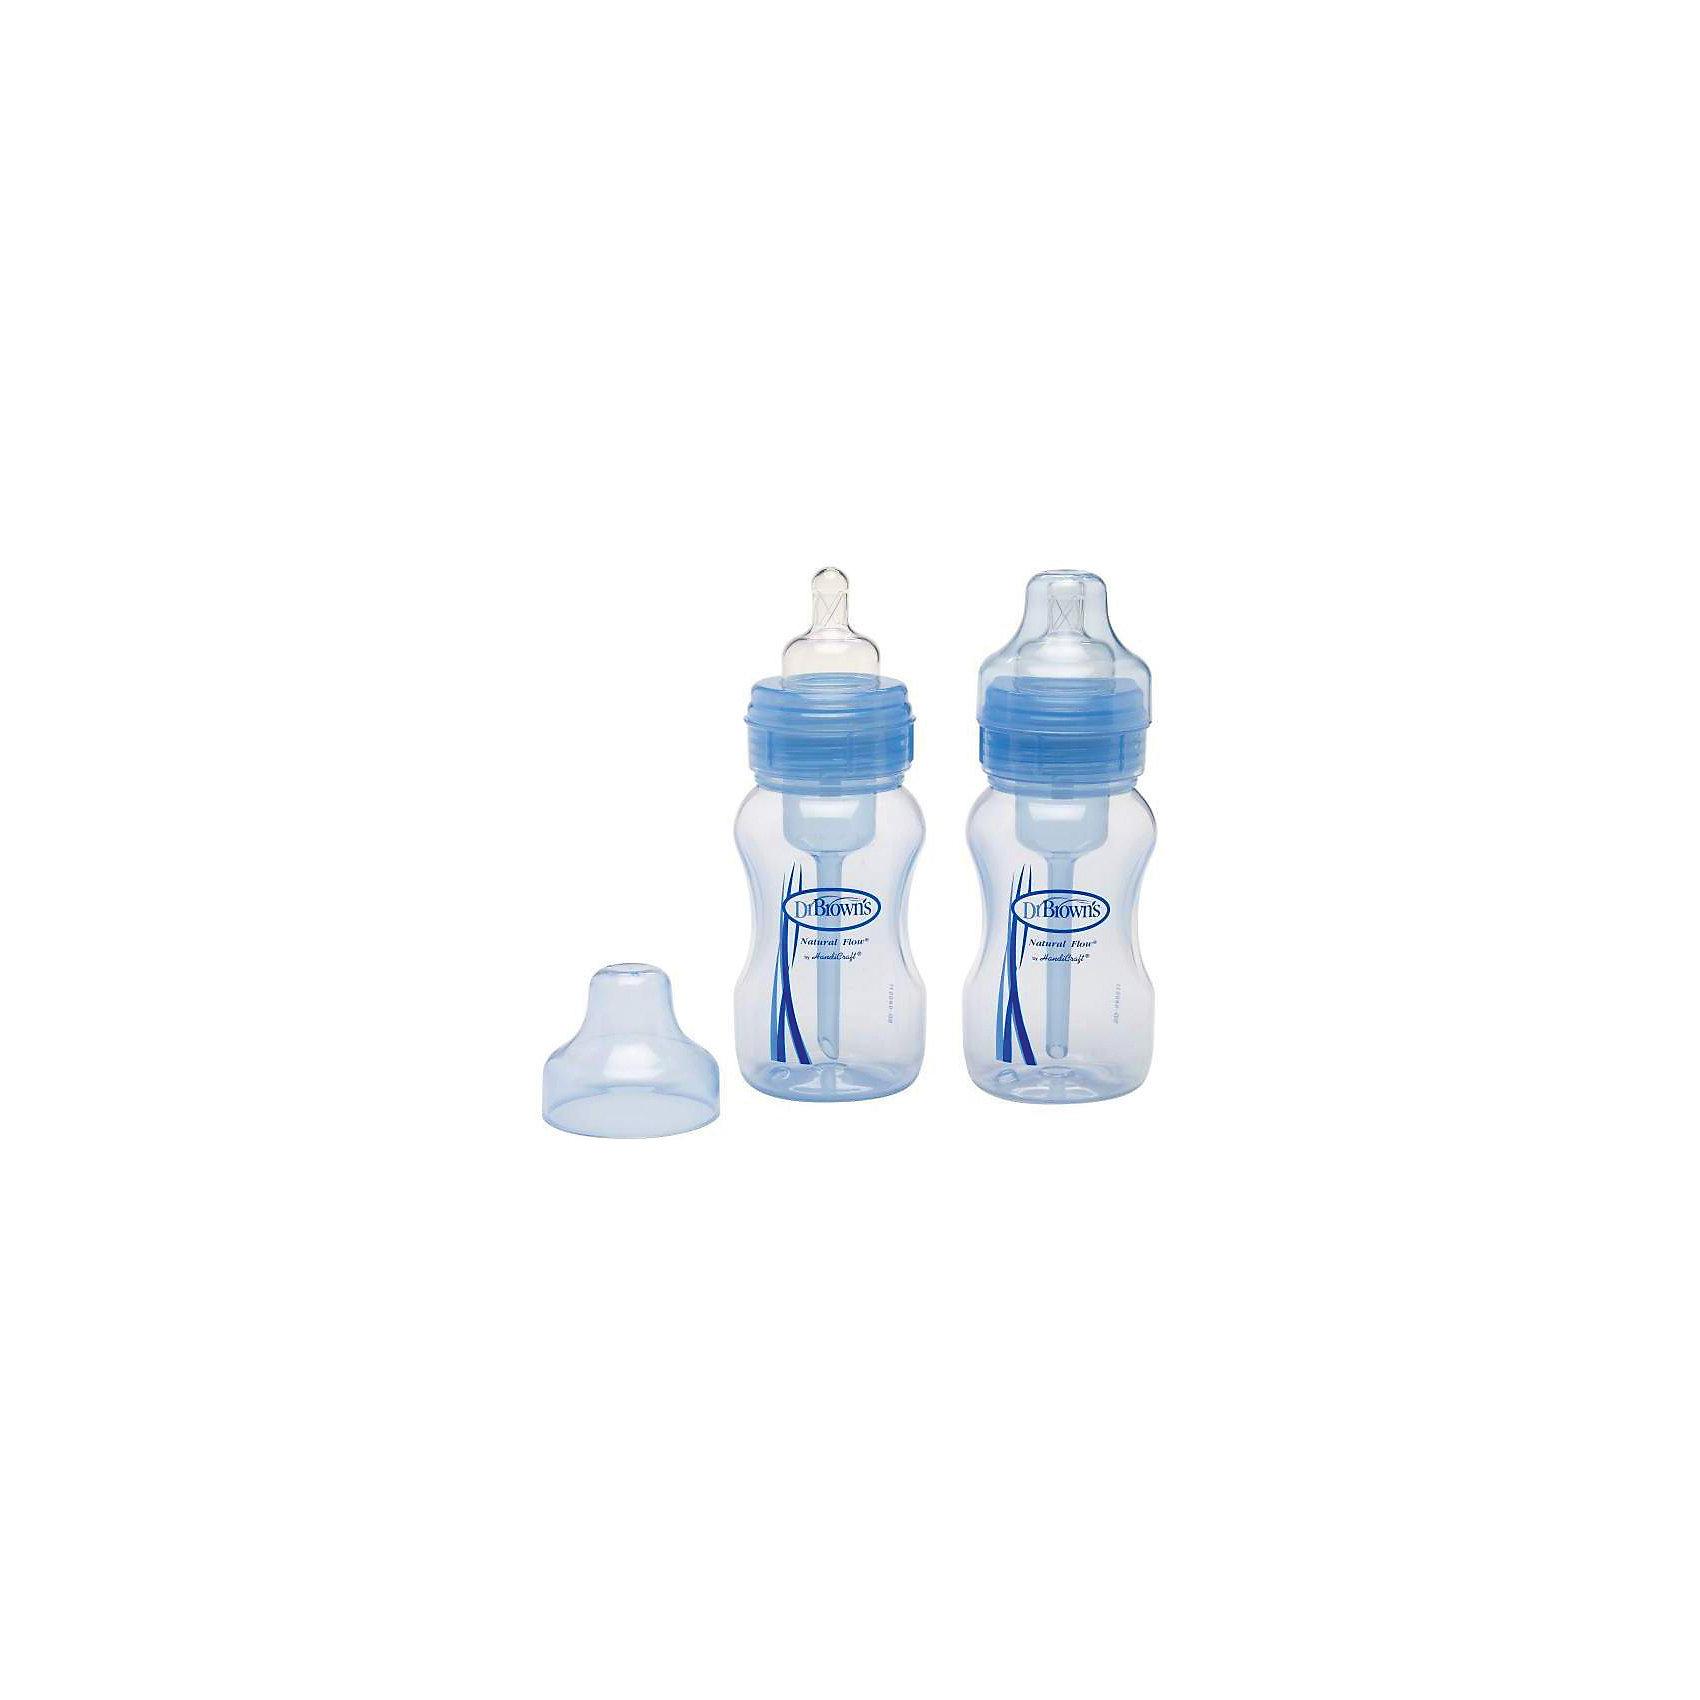 Набор из 2-х бутылочек с широким горлышком 240 мл, полипропилен, Dr. Brown, синий